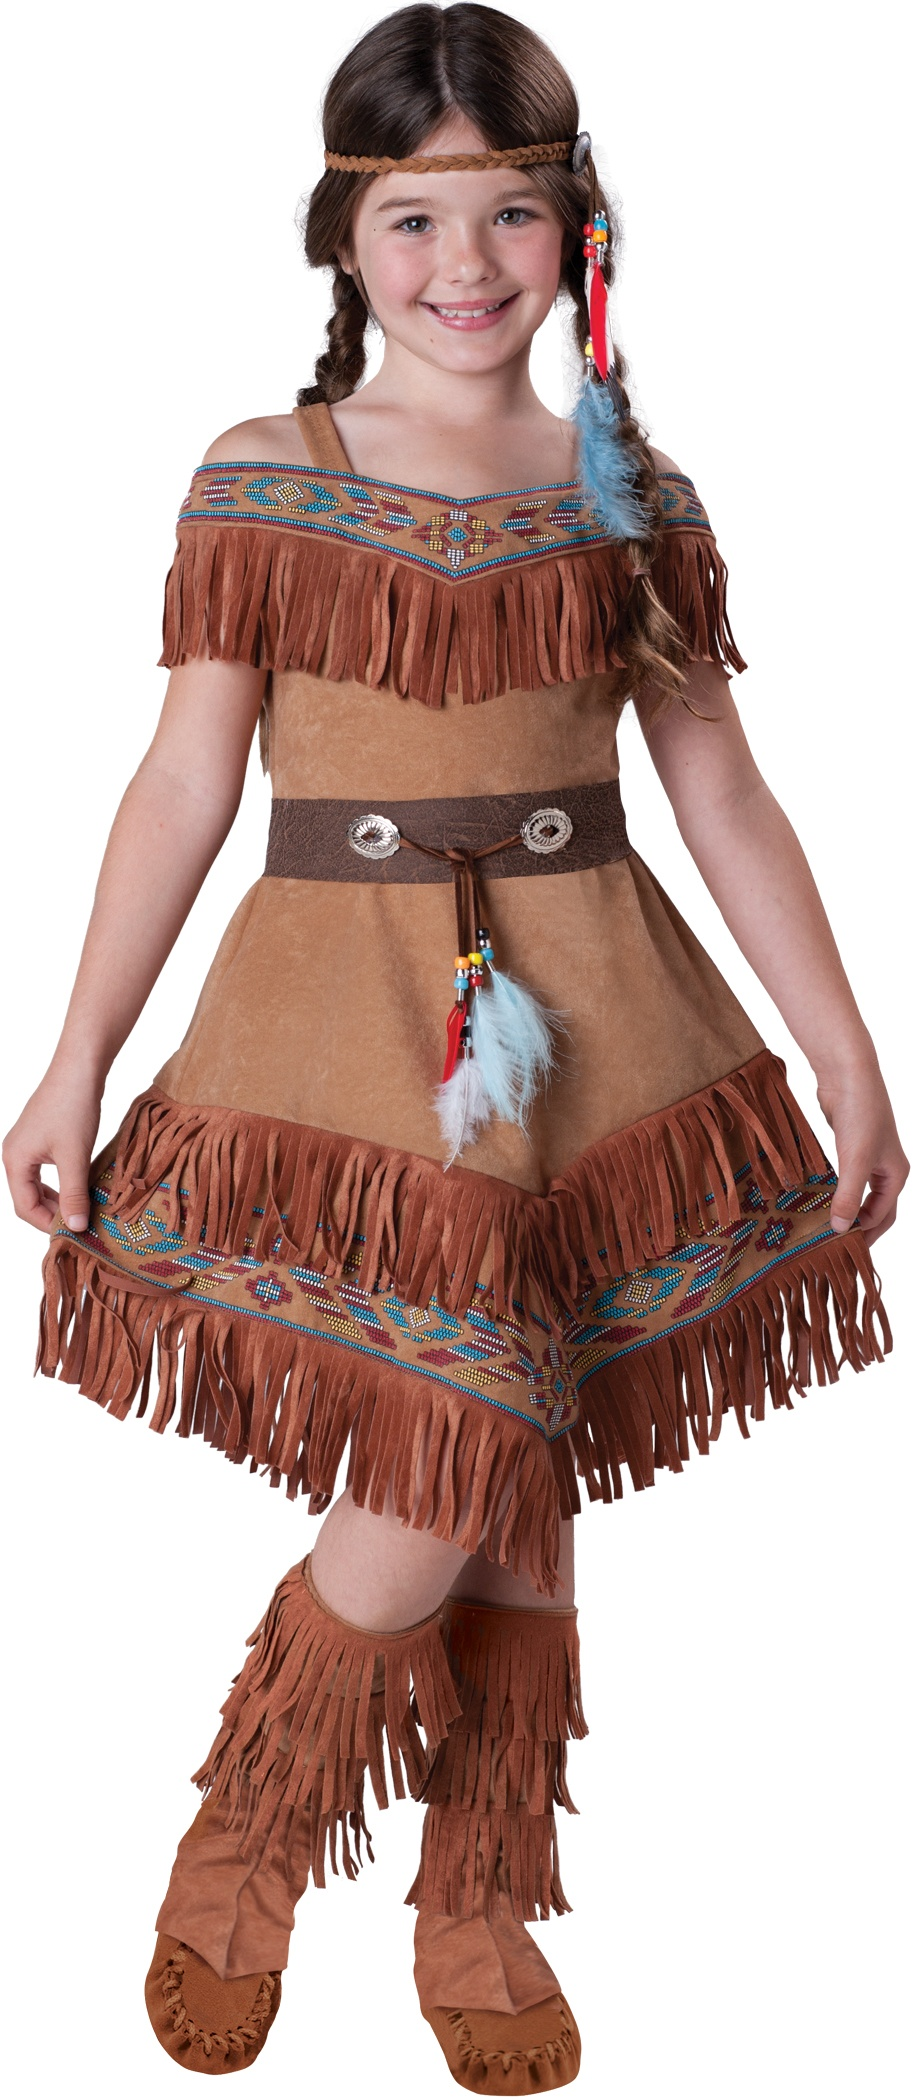 Indian Maiden Girls Costume